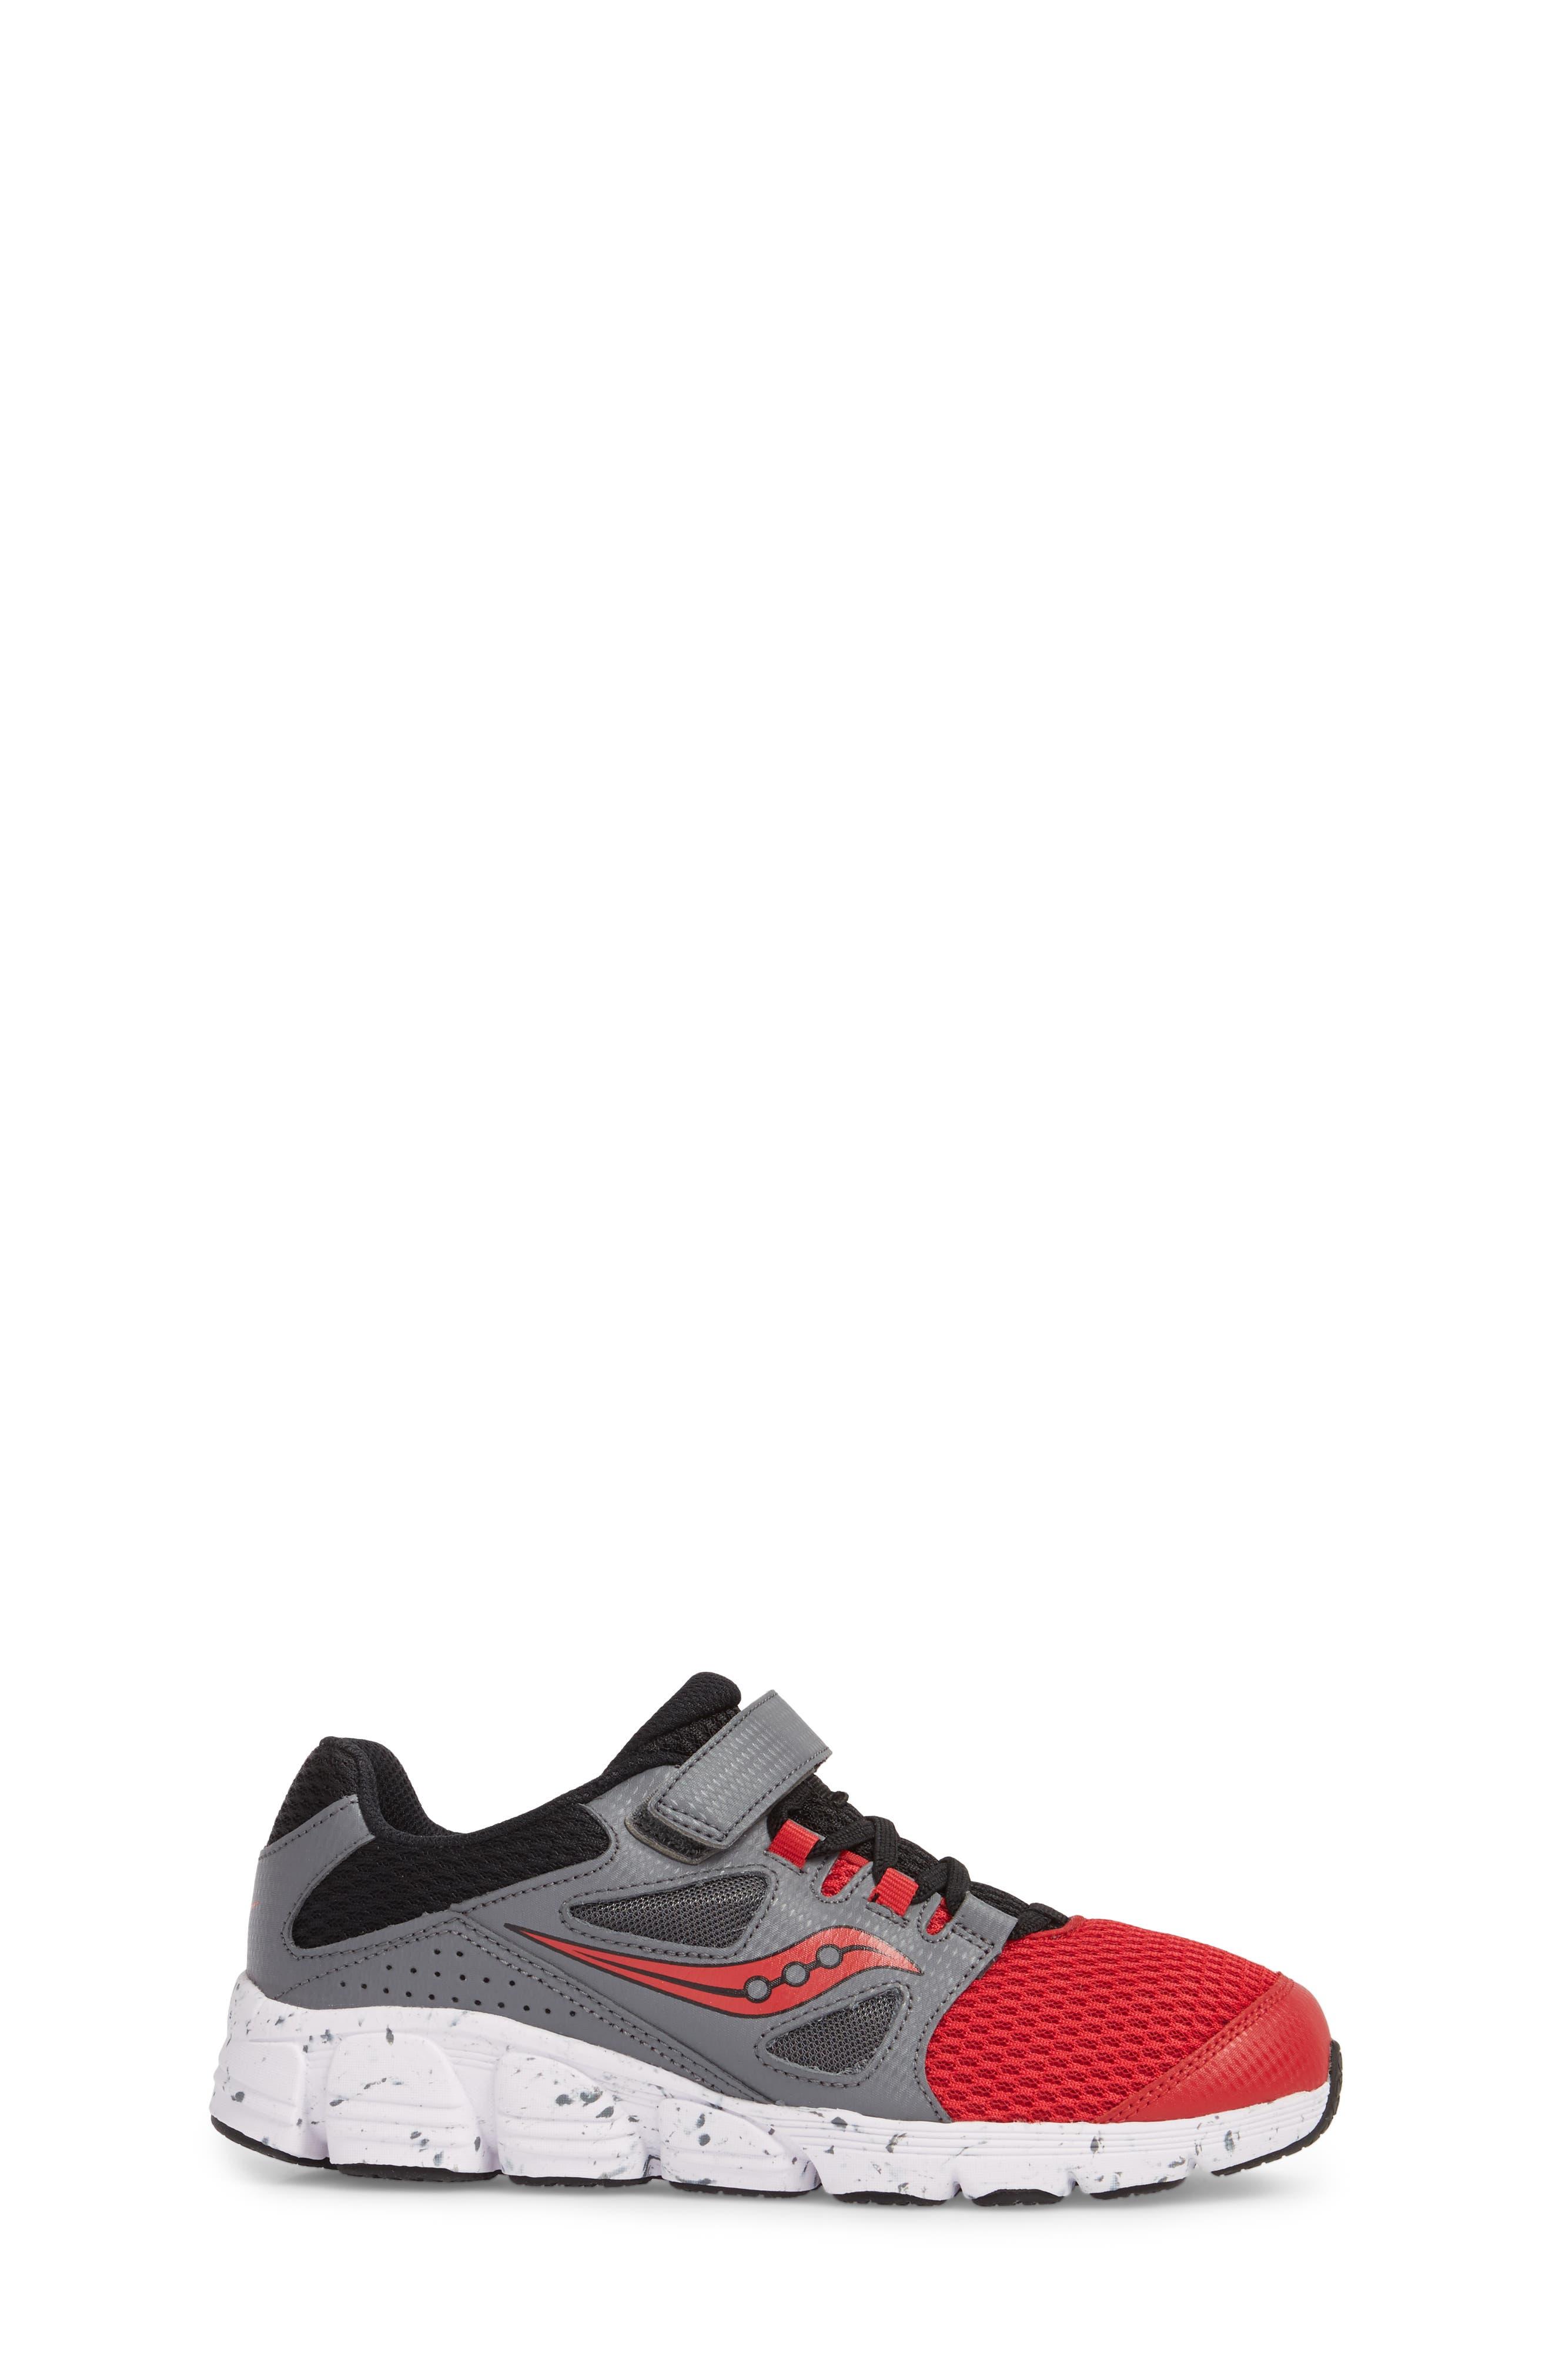 Kotaro 4 Sneaker,                             Alternate thumbnail 3, color,                             Red/ Grey